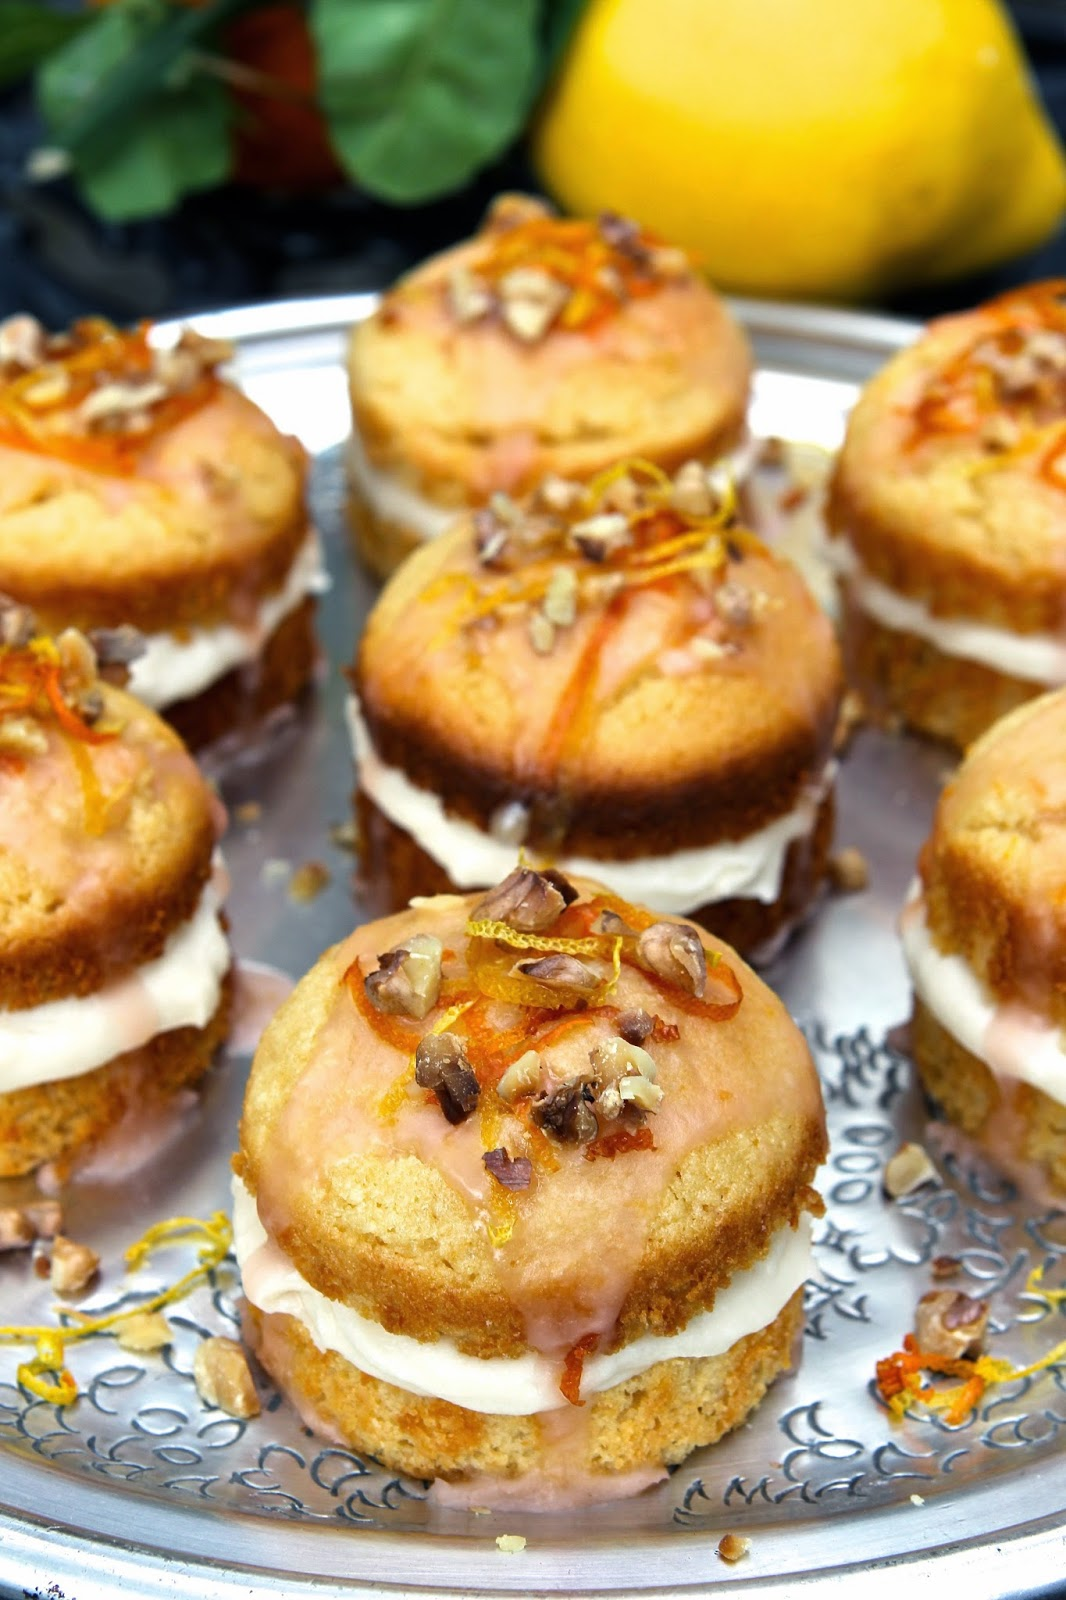 Fatless Sponge Cake Recipe Mary Berry